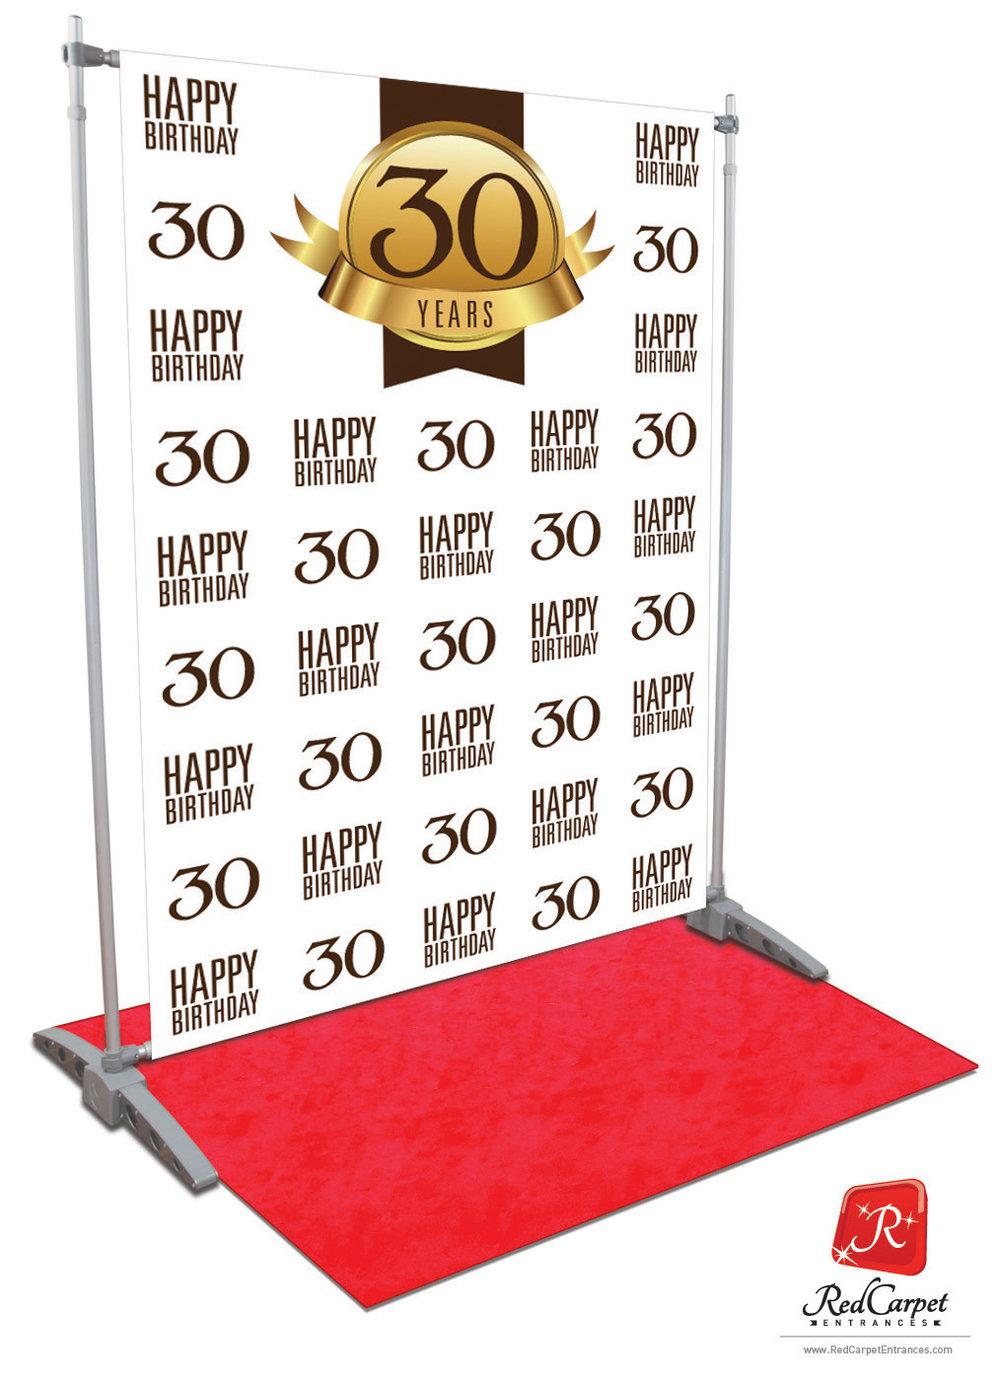 30th Birthday Backdrop Red Carpet Kit White 5x8 Red